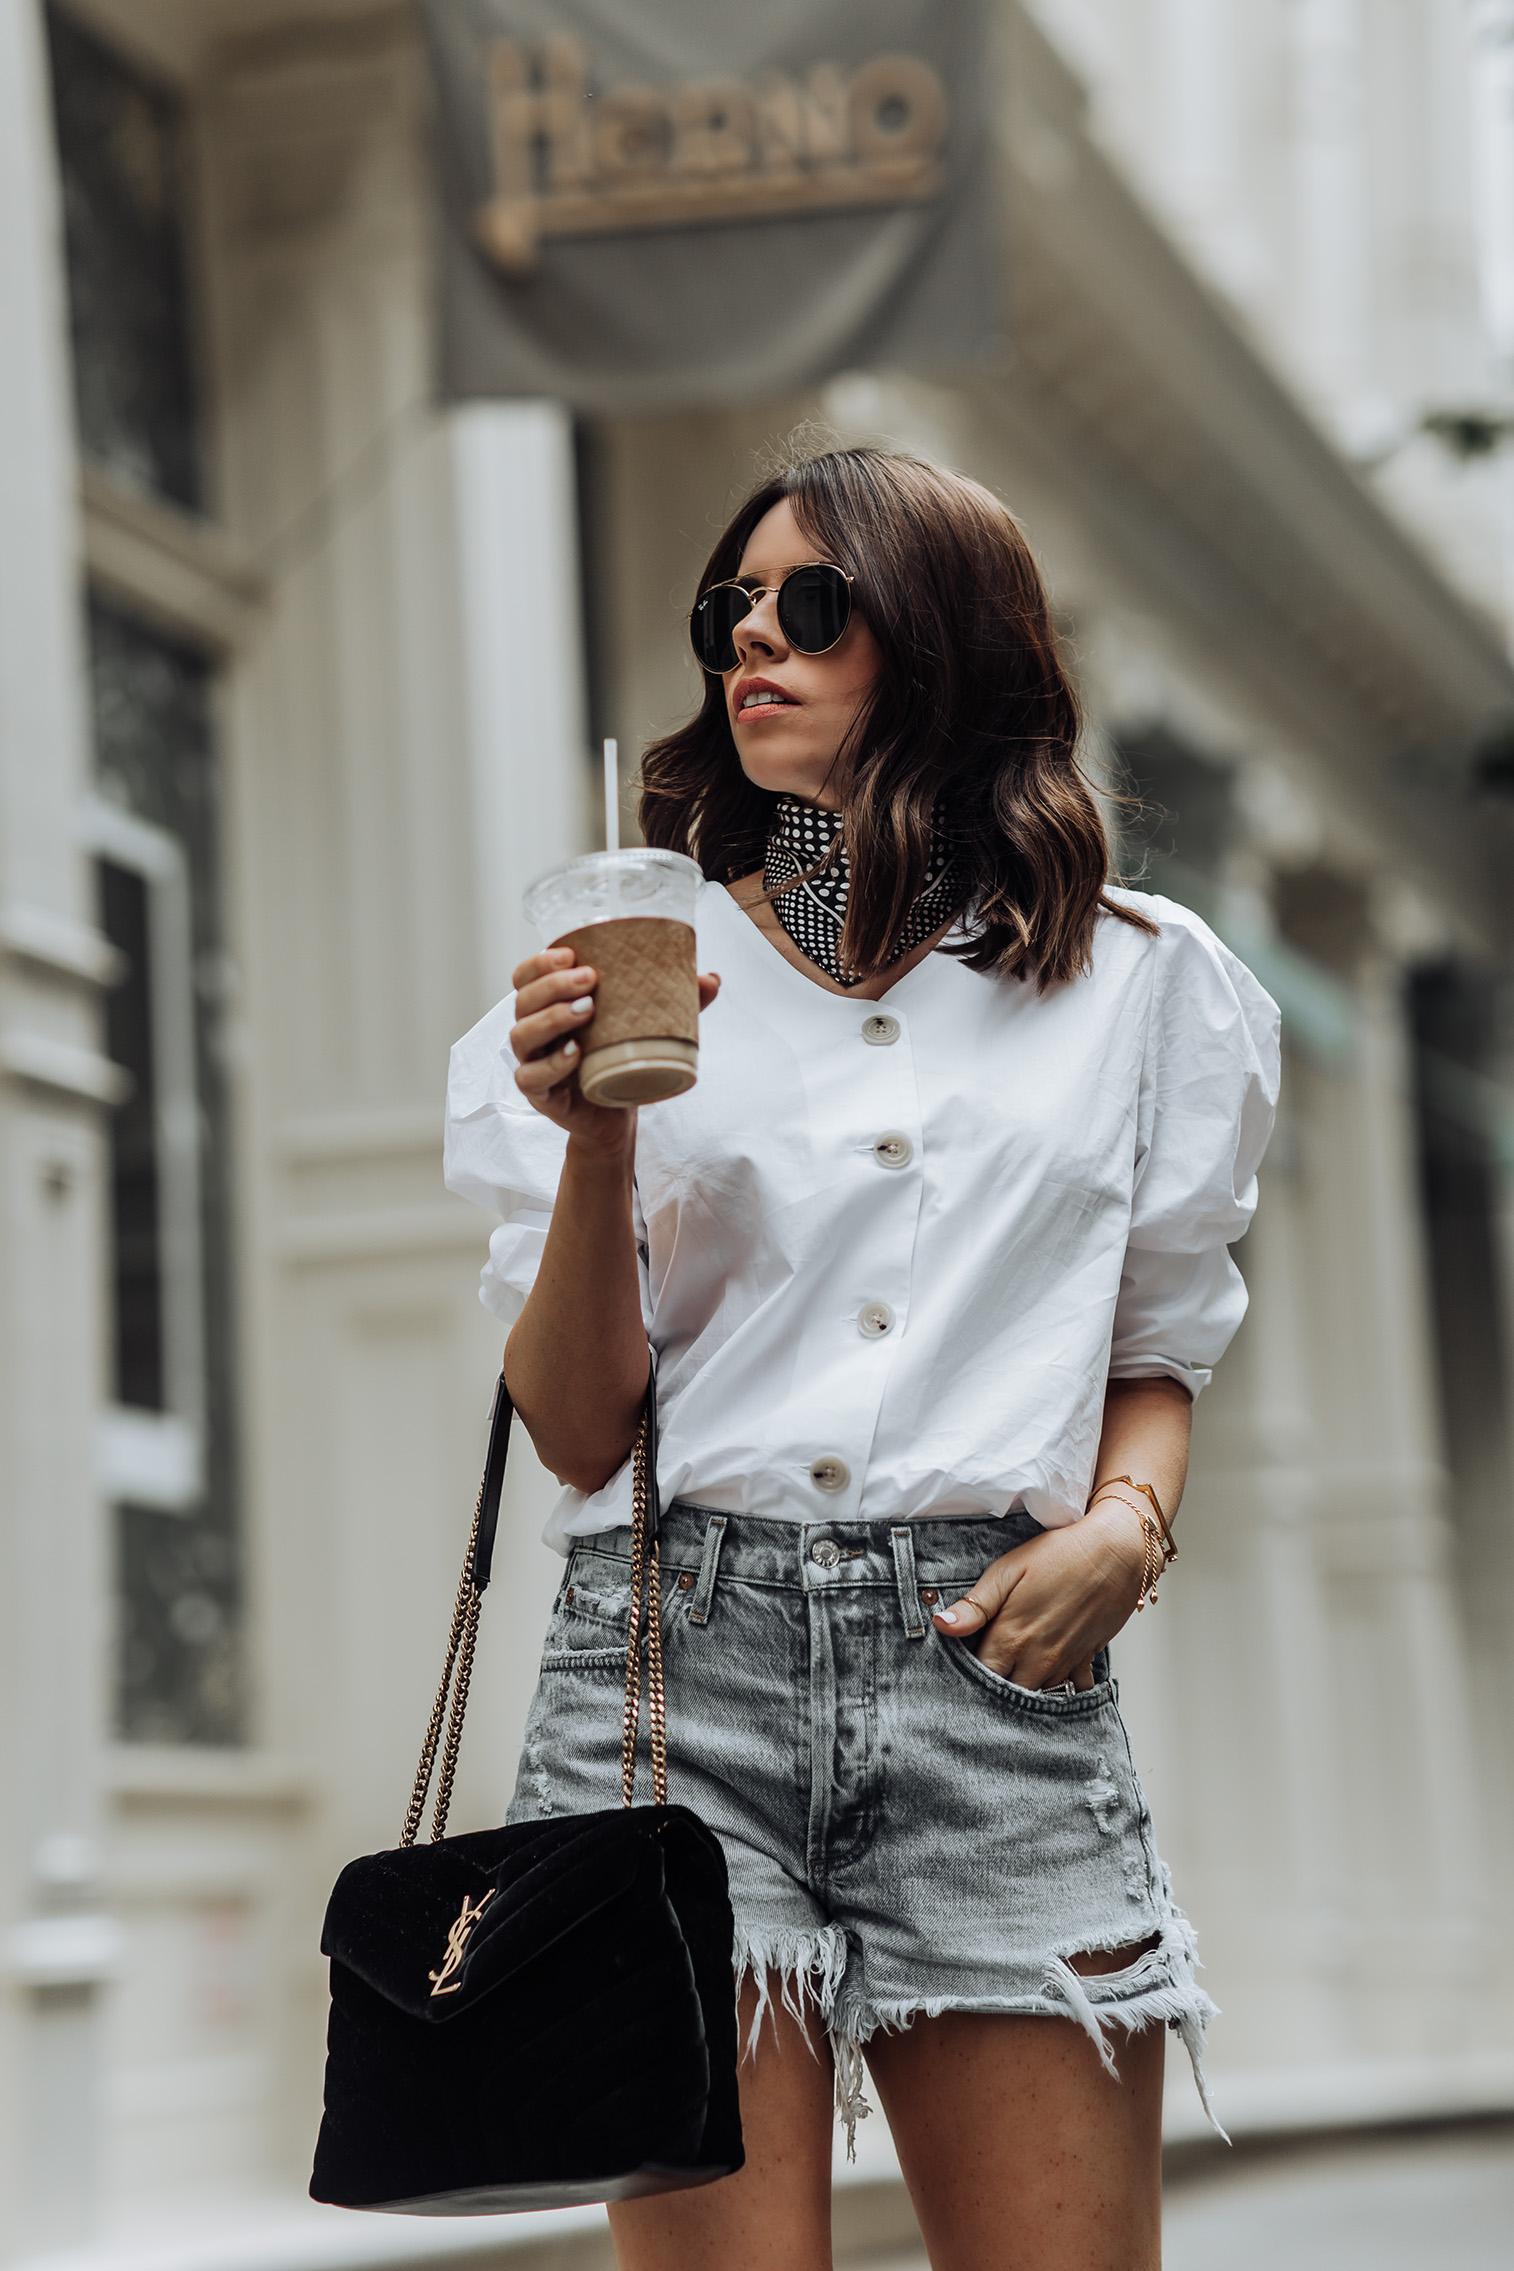 Edge | Puff Sleeve Top | Agolde Shorts | YSL Bag | Zara boots |#liketkit #streetstyle